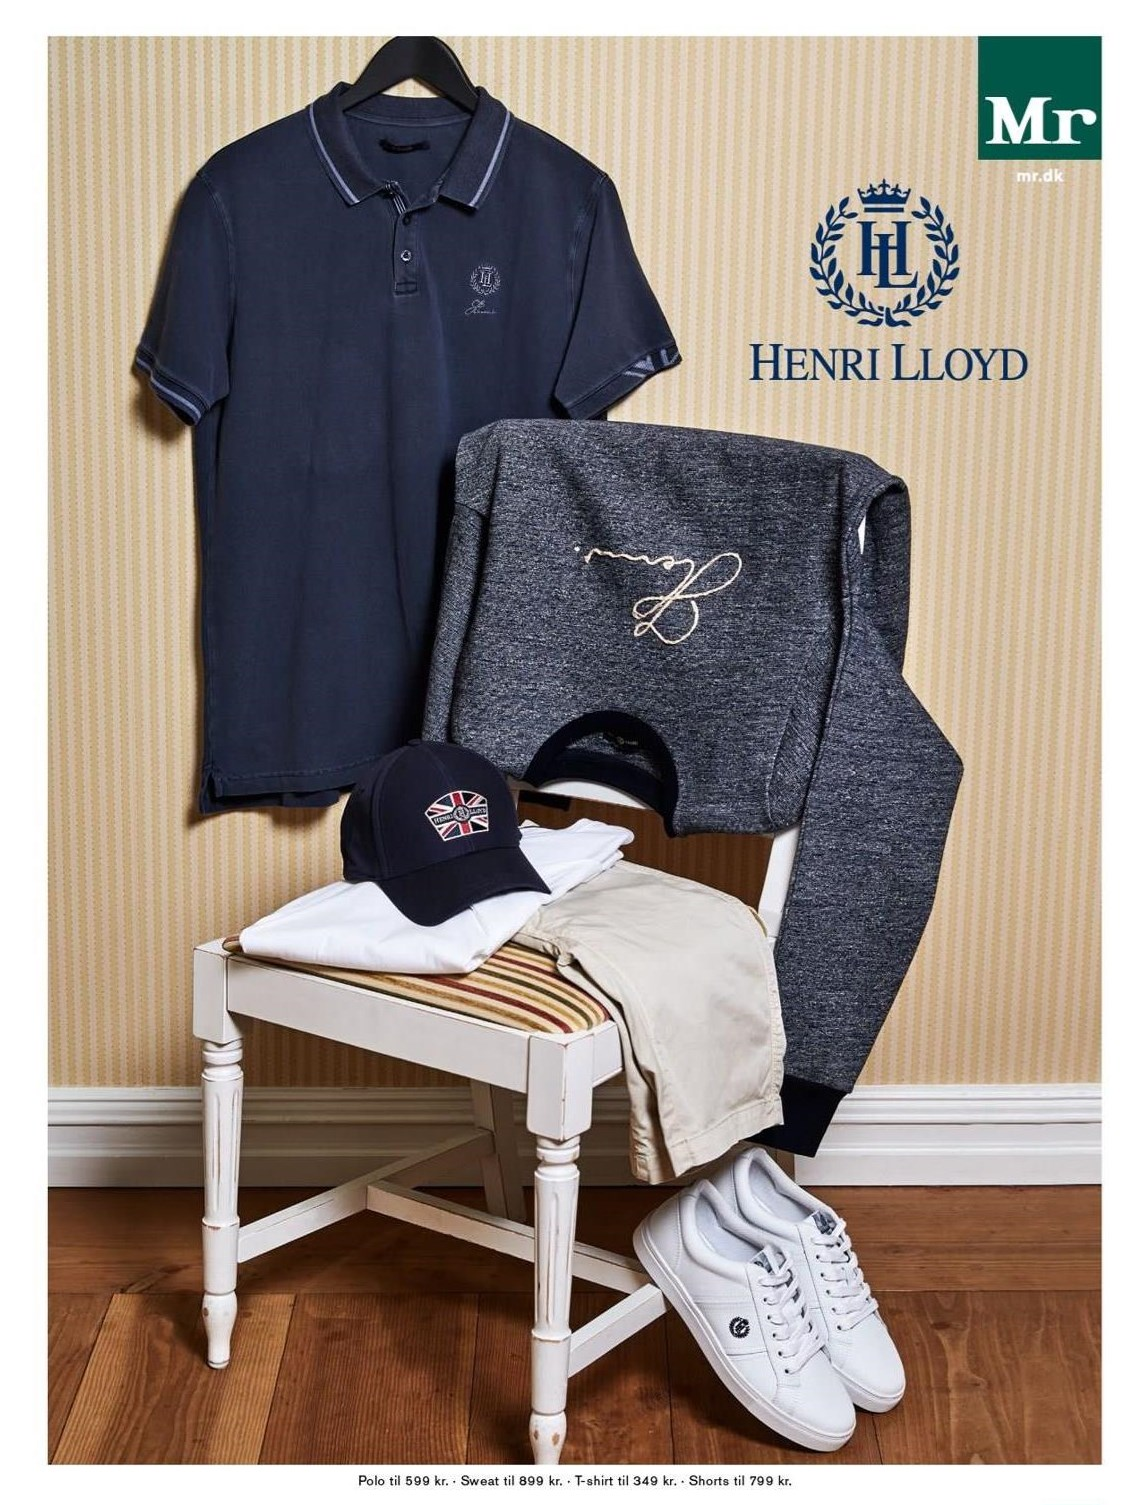 Polo, sweat, t-shirt eller shorts